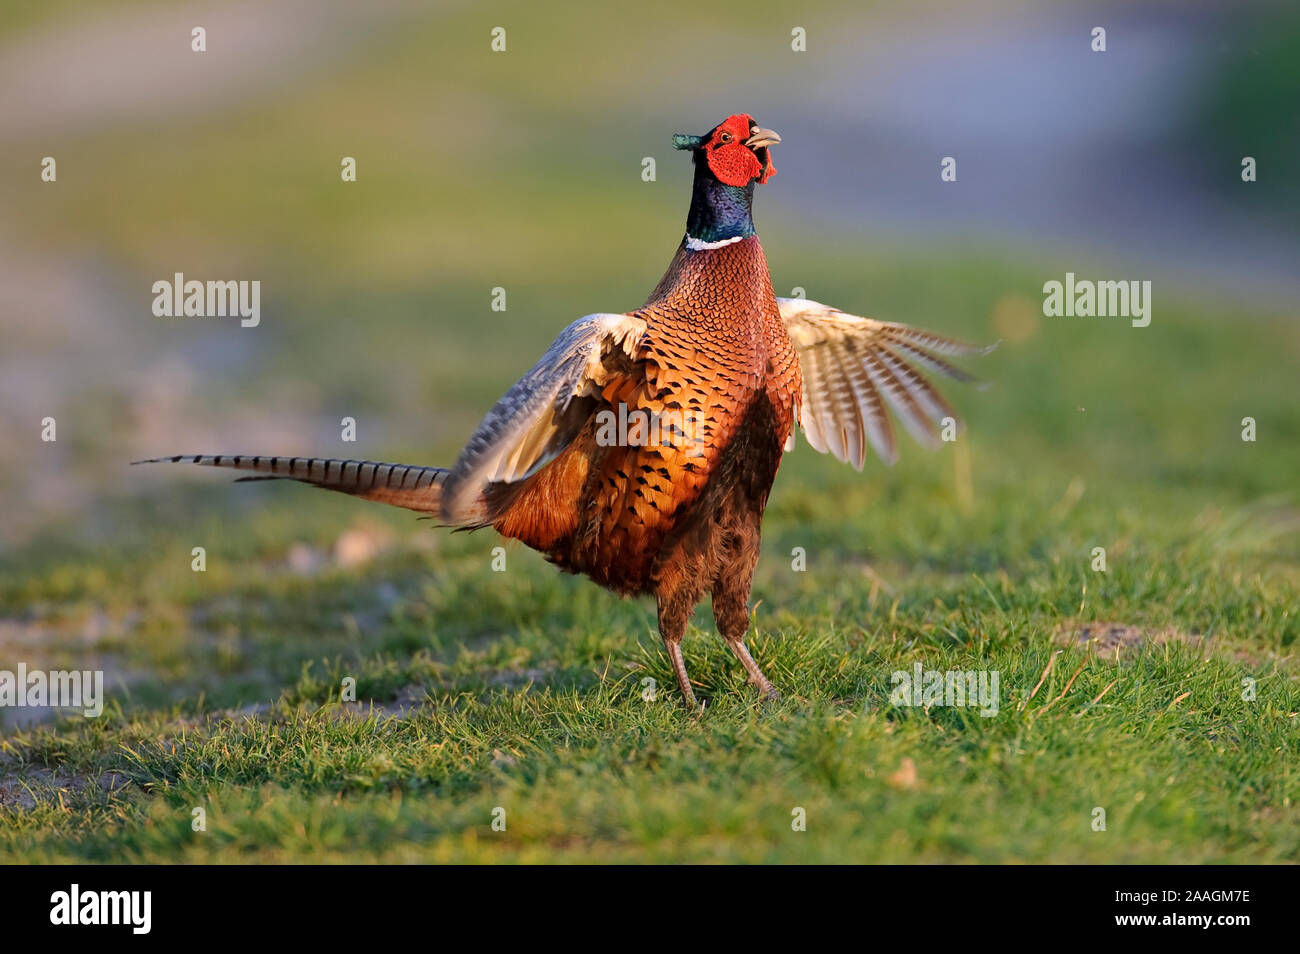 Fasan, Balz, Phasianus colchicus, Common Pheasant Stock Photo